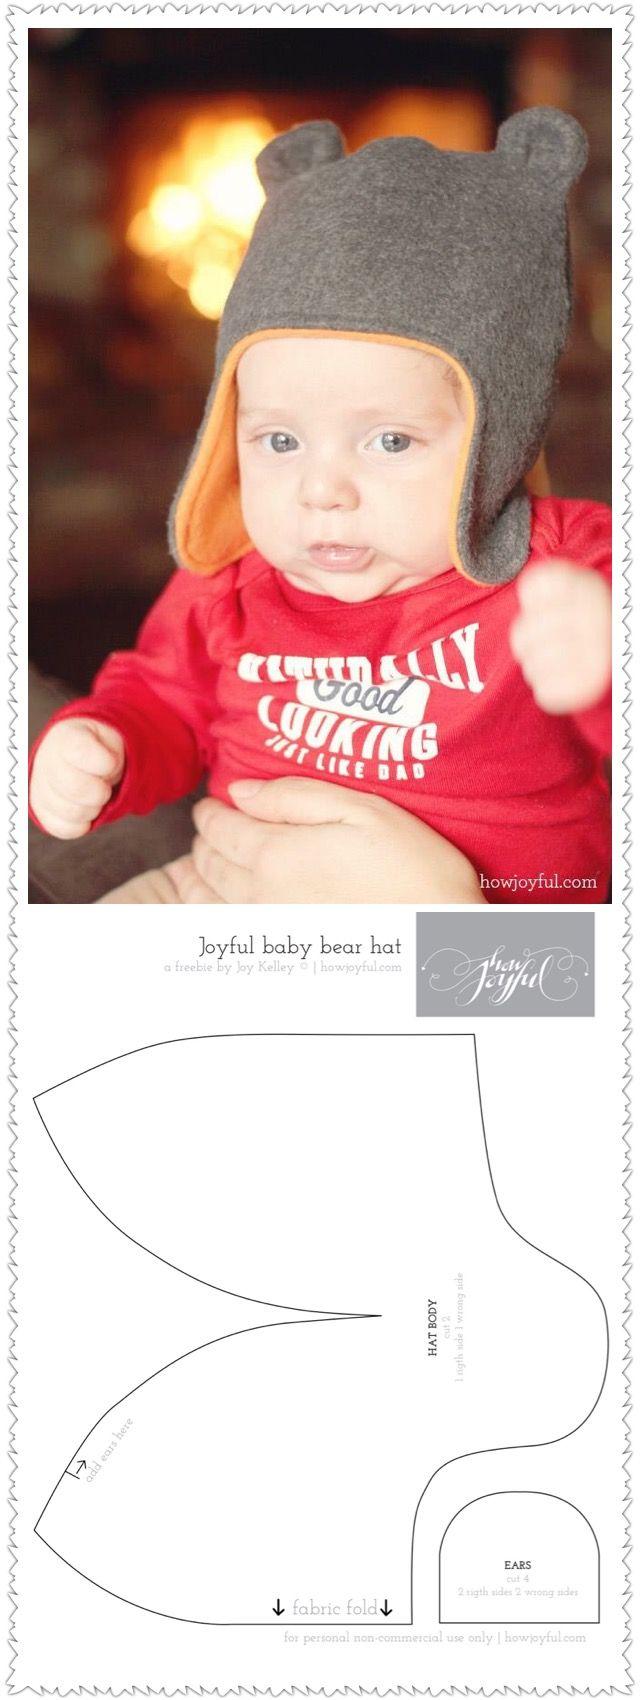 車縫頂熊仔帽俾BB戴:http://www.howjoyfulblog.com/2013/02/joyful-baby-hat-with-teddy-bear-ears-tutorial-and-pattern/  紙樣:http://howjoyful.webs.com/tutorials/joyful-bear-hat.pdf